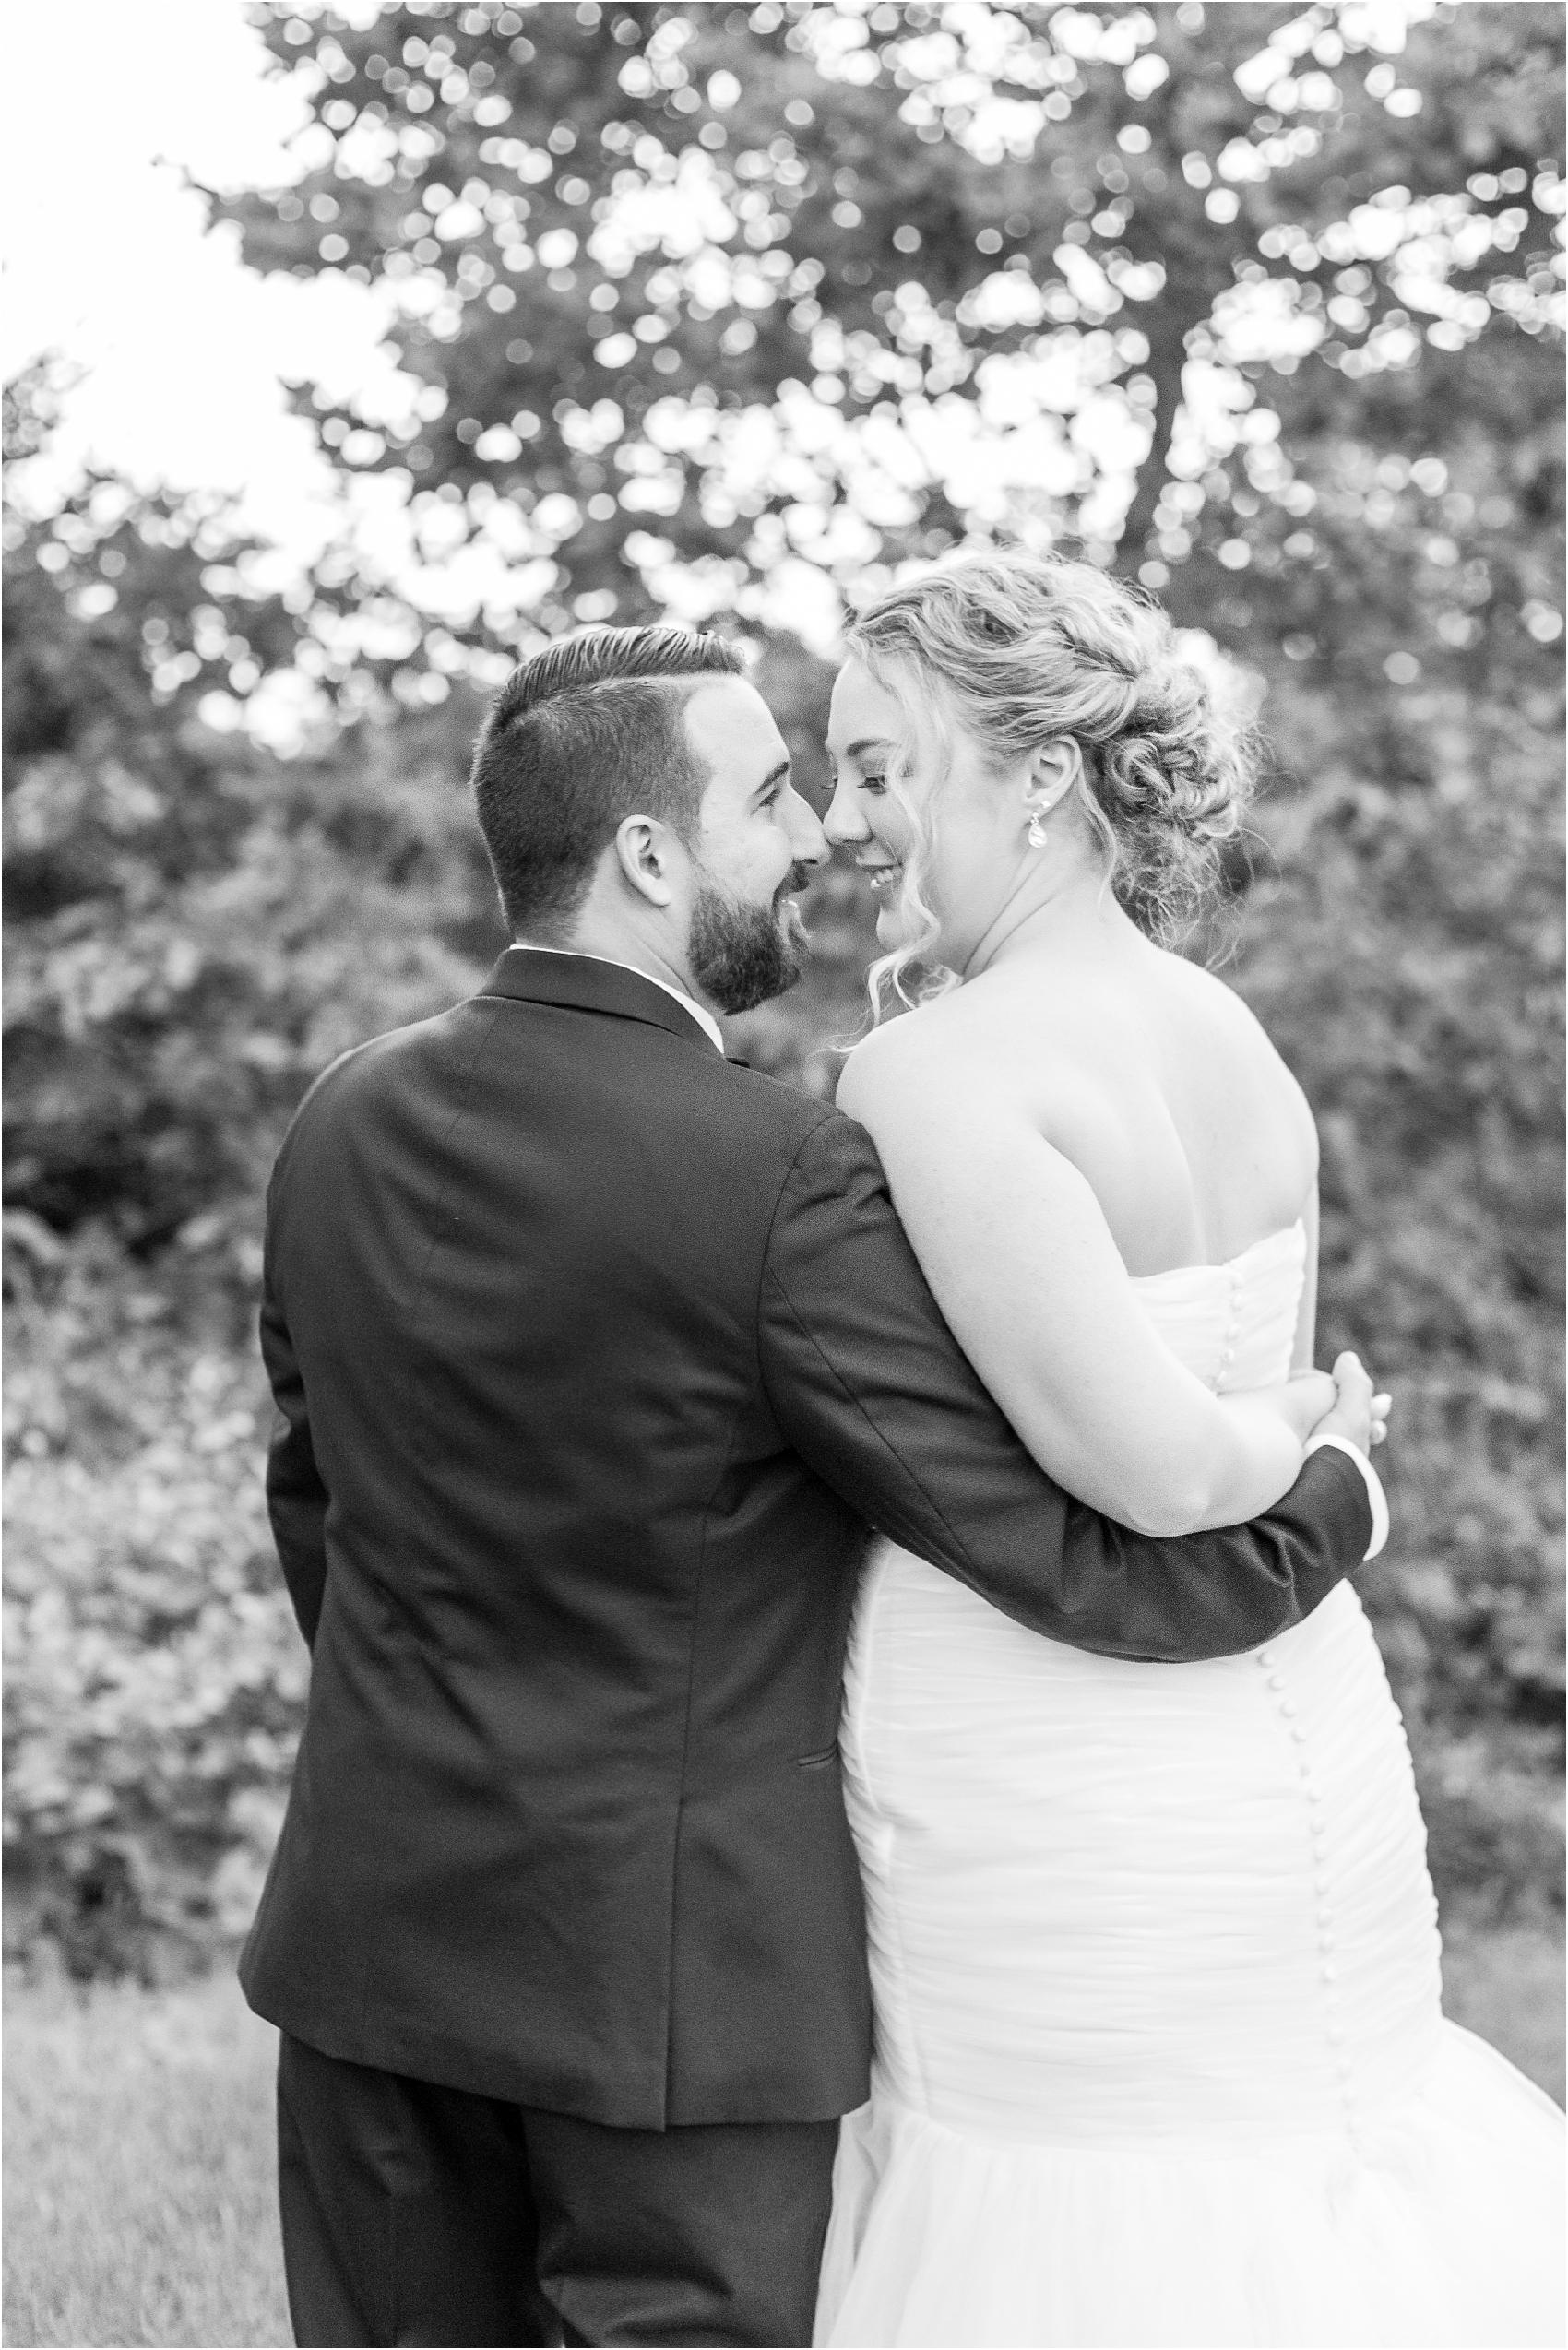 joyful-and-candid-navy-blush-wedding-photos-at-crystal-gardens-in-howell-mi-by-courtney-carolyn-photography_0116.jpg